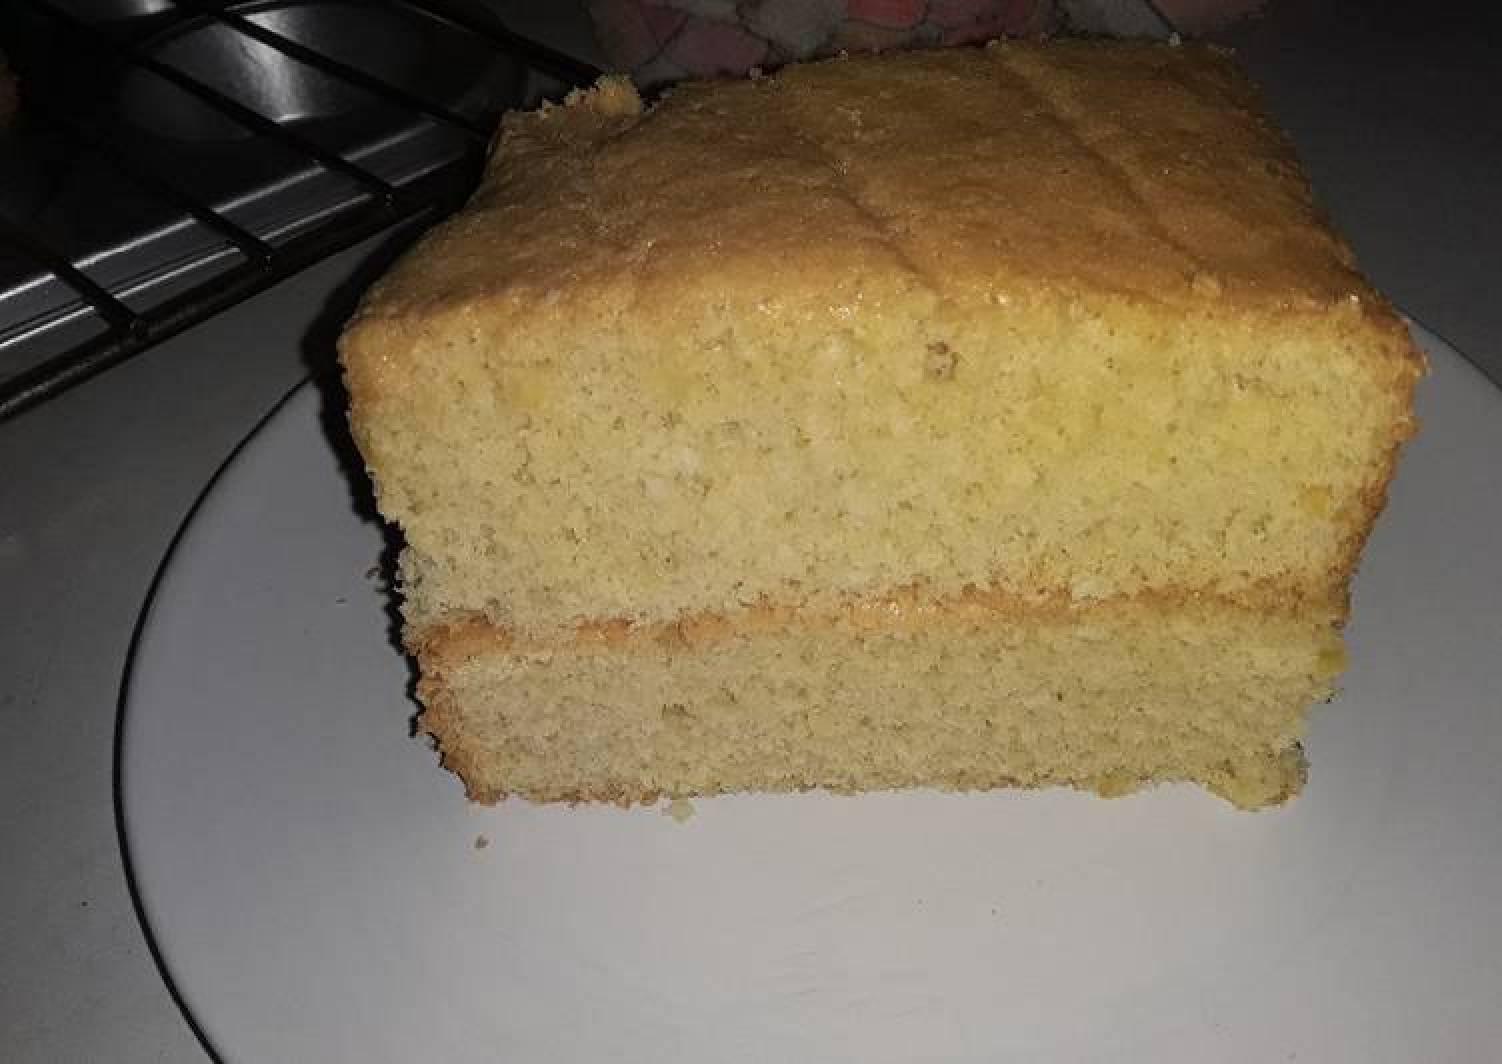 Simple European Sponge Cake